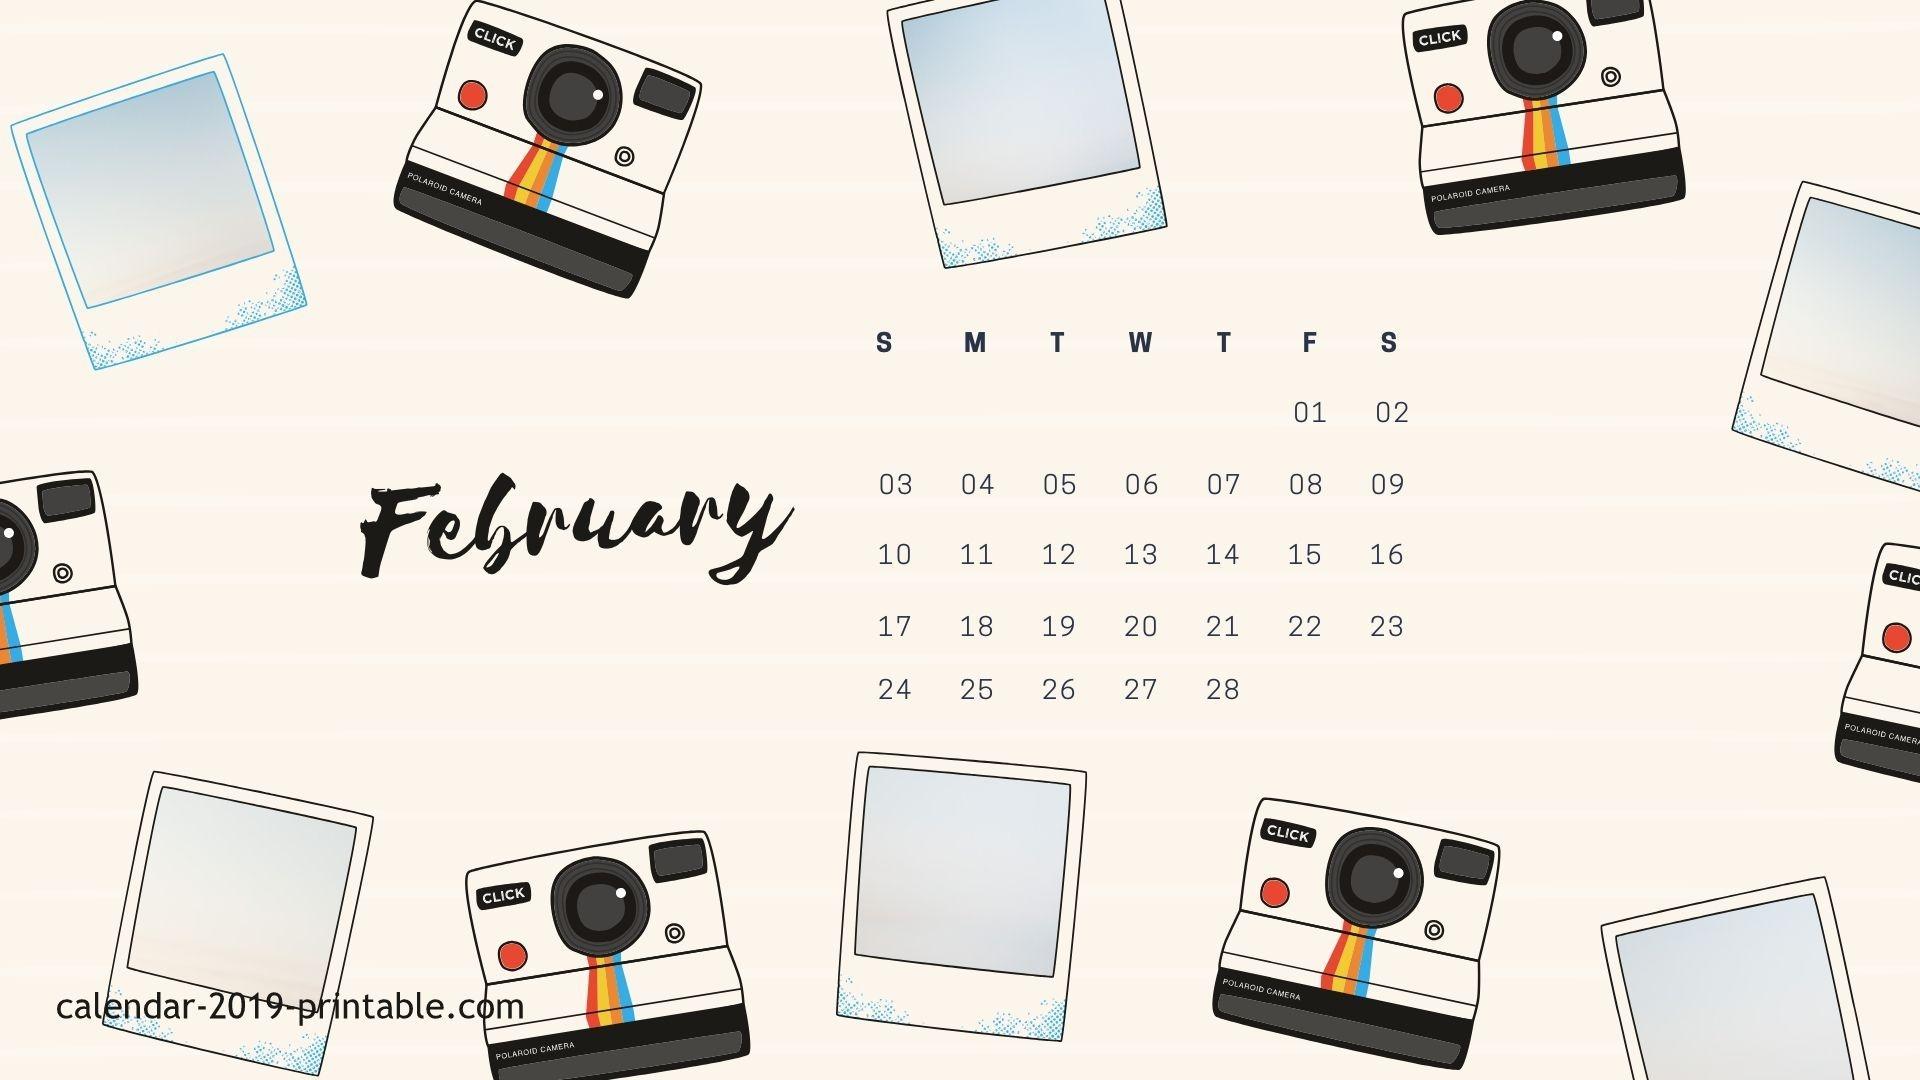 February 2019 Desktop Calendar Blue Jeans Desktop Wallpaper Calendar February 2019   Desk Decorating Ideas